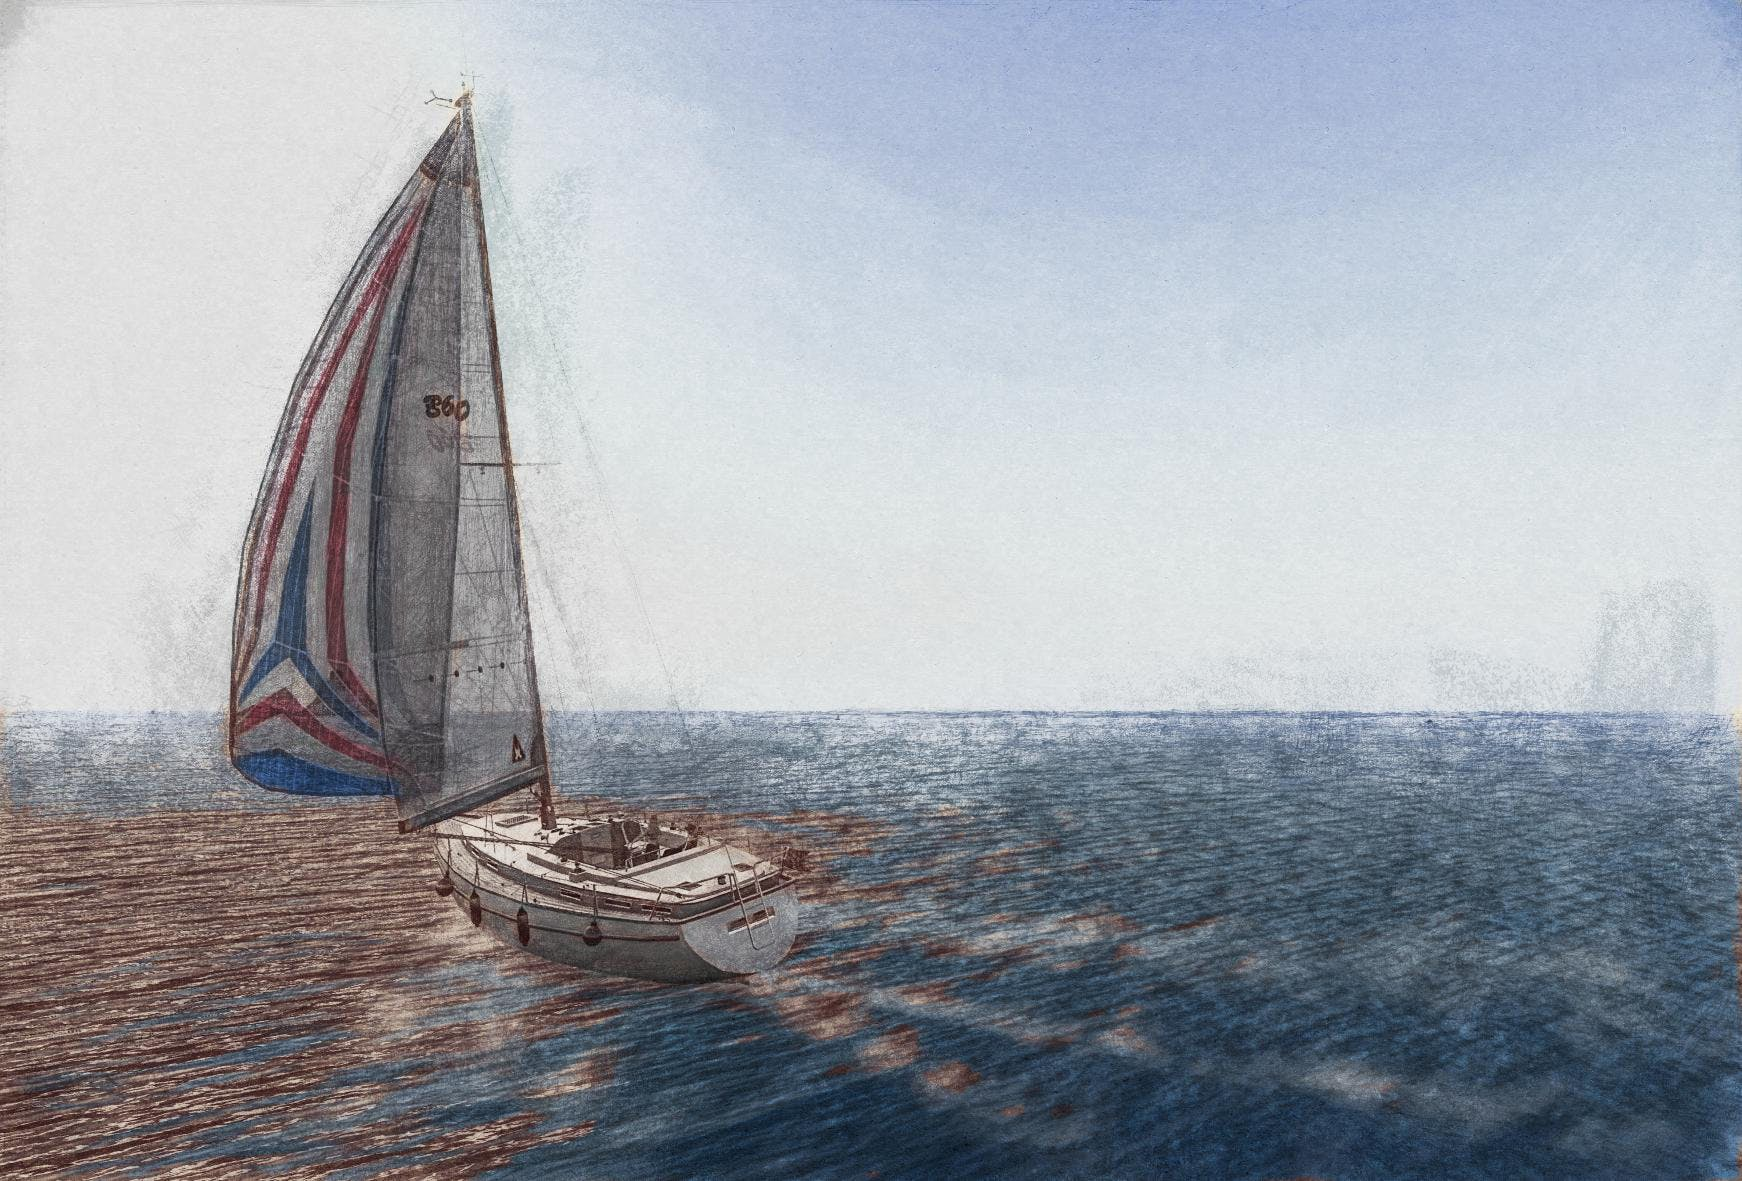 Free stock photo of sail boat, abstract photo